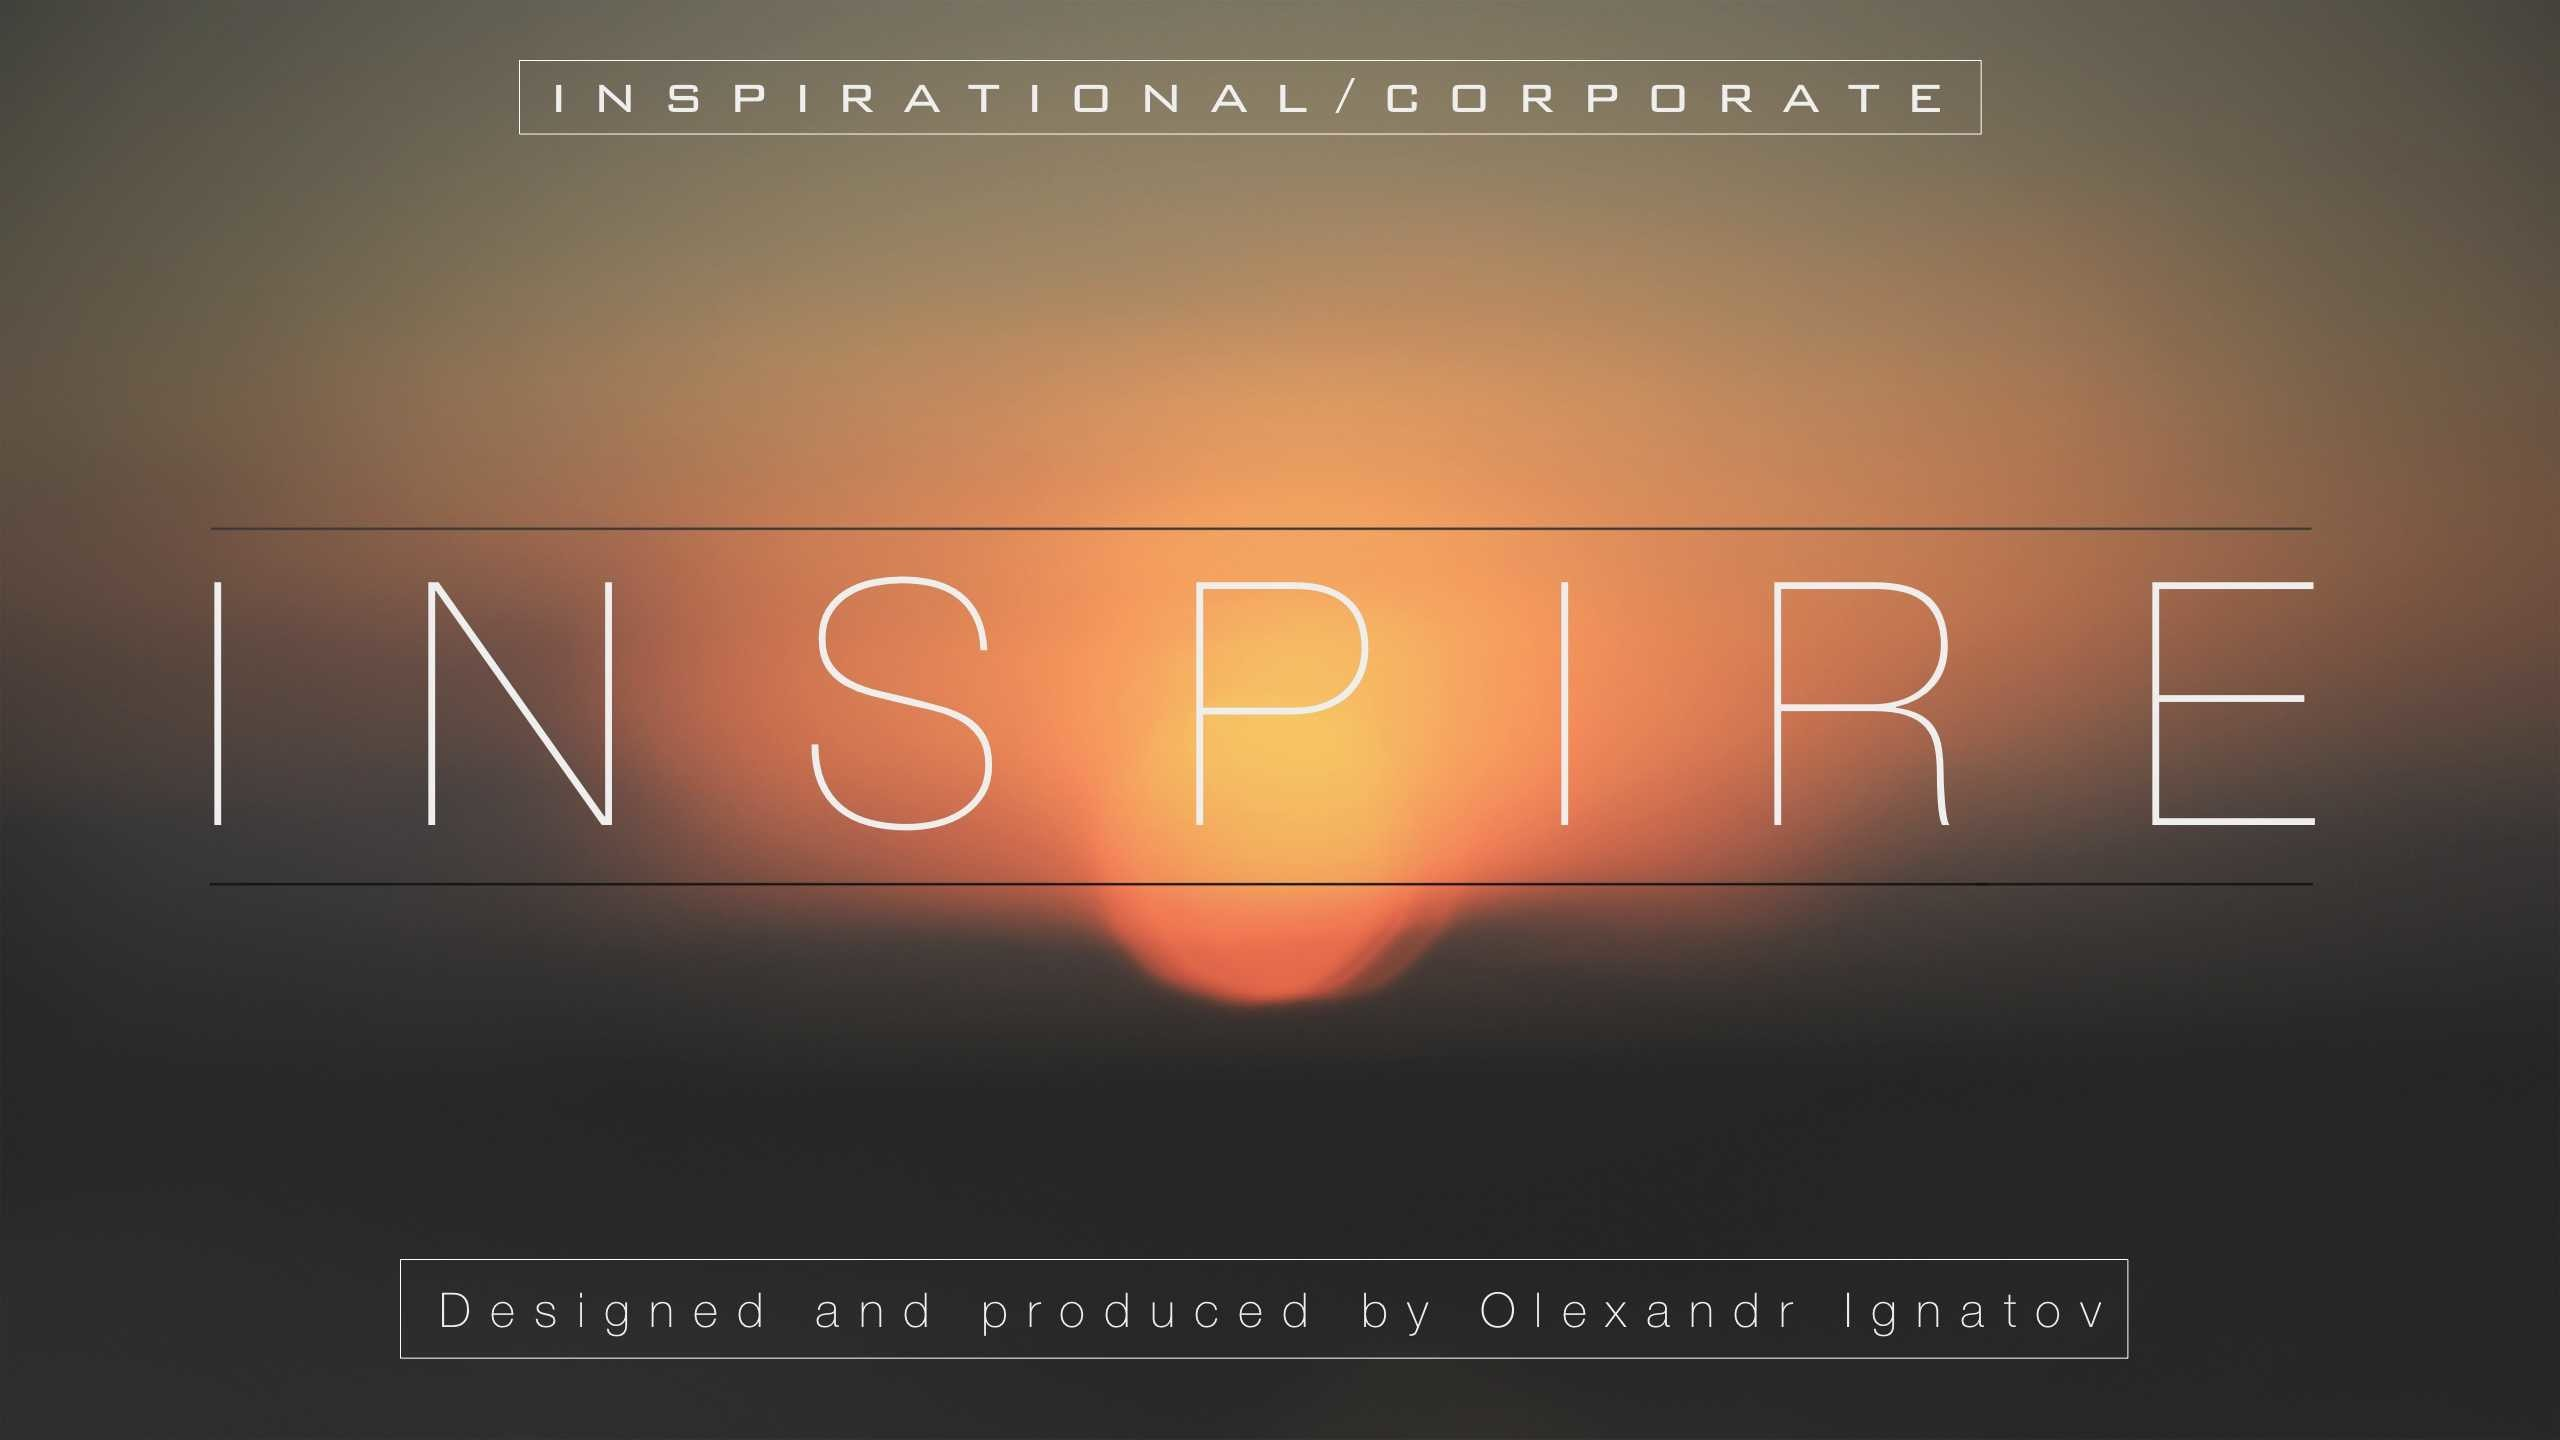 inspirational music production wallpaper –  https://hdwallpaper.info/inspirational-music